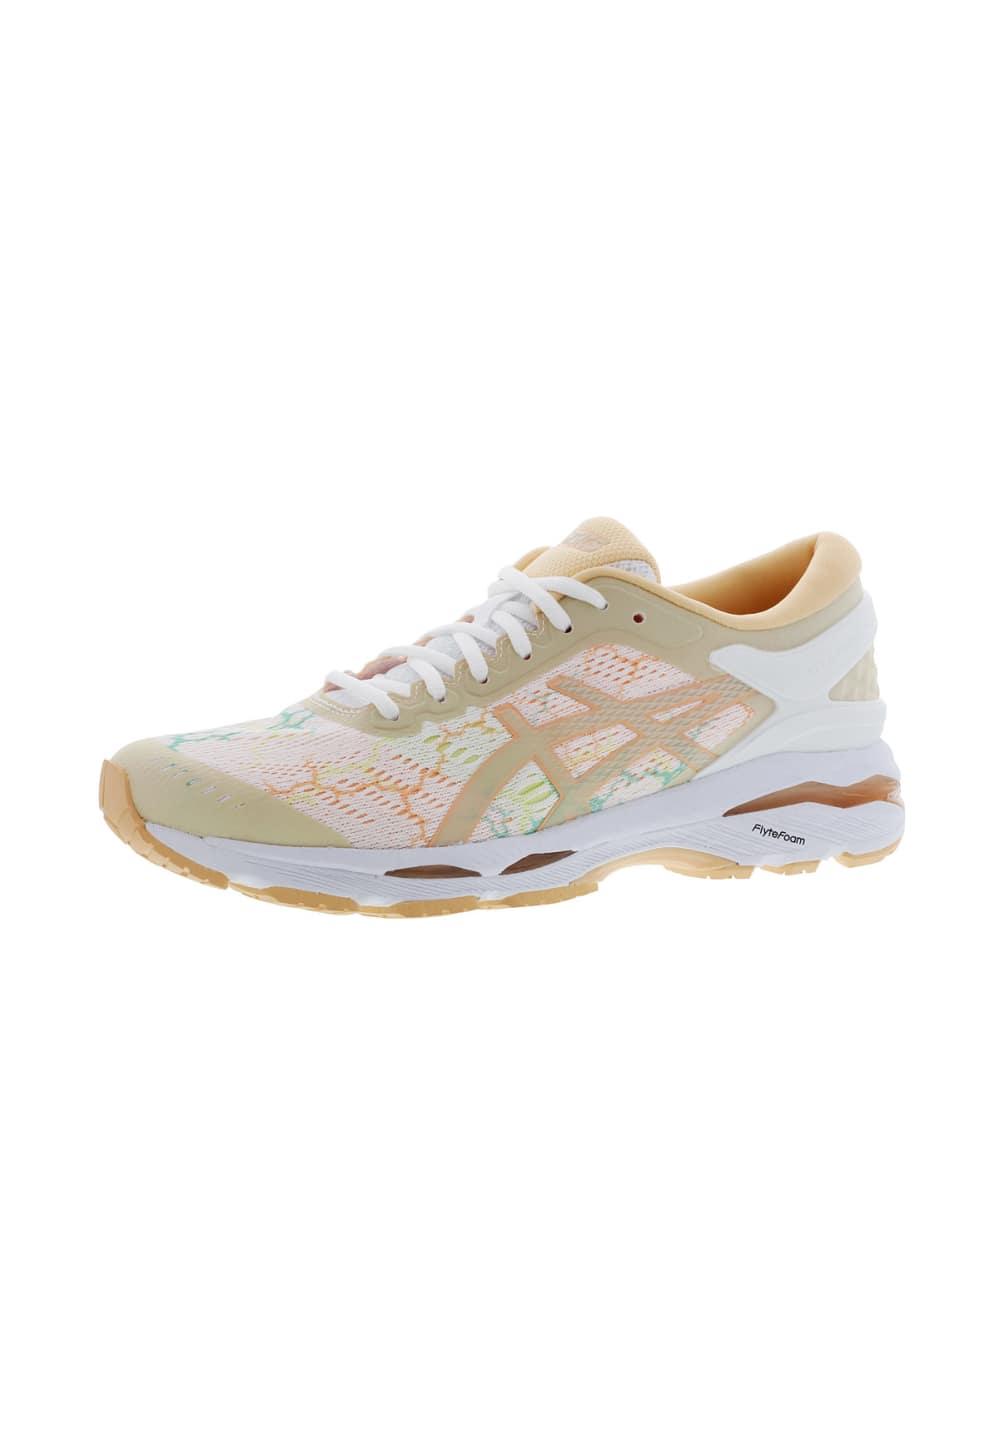 5b492b23 ASICS GEL-Kayano 24 Lite-Show - Running shoes for Women - White